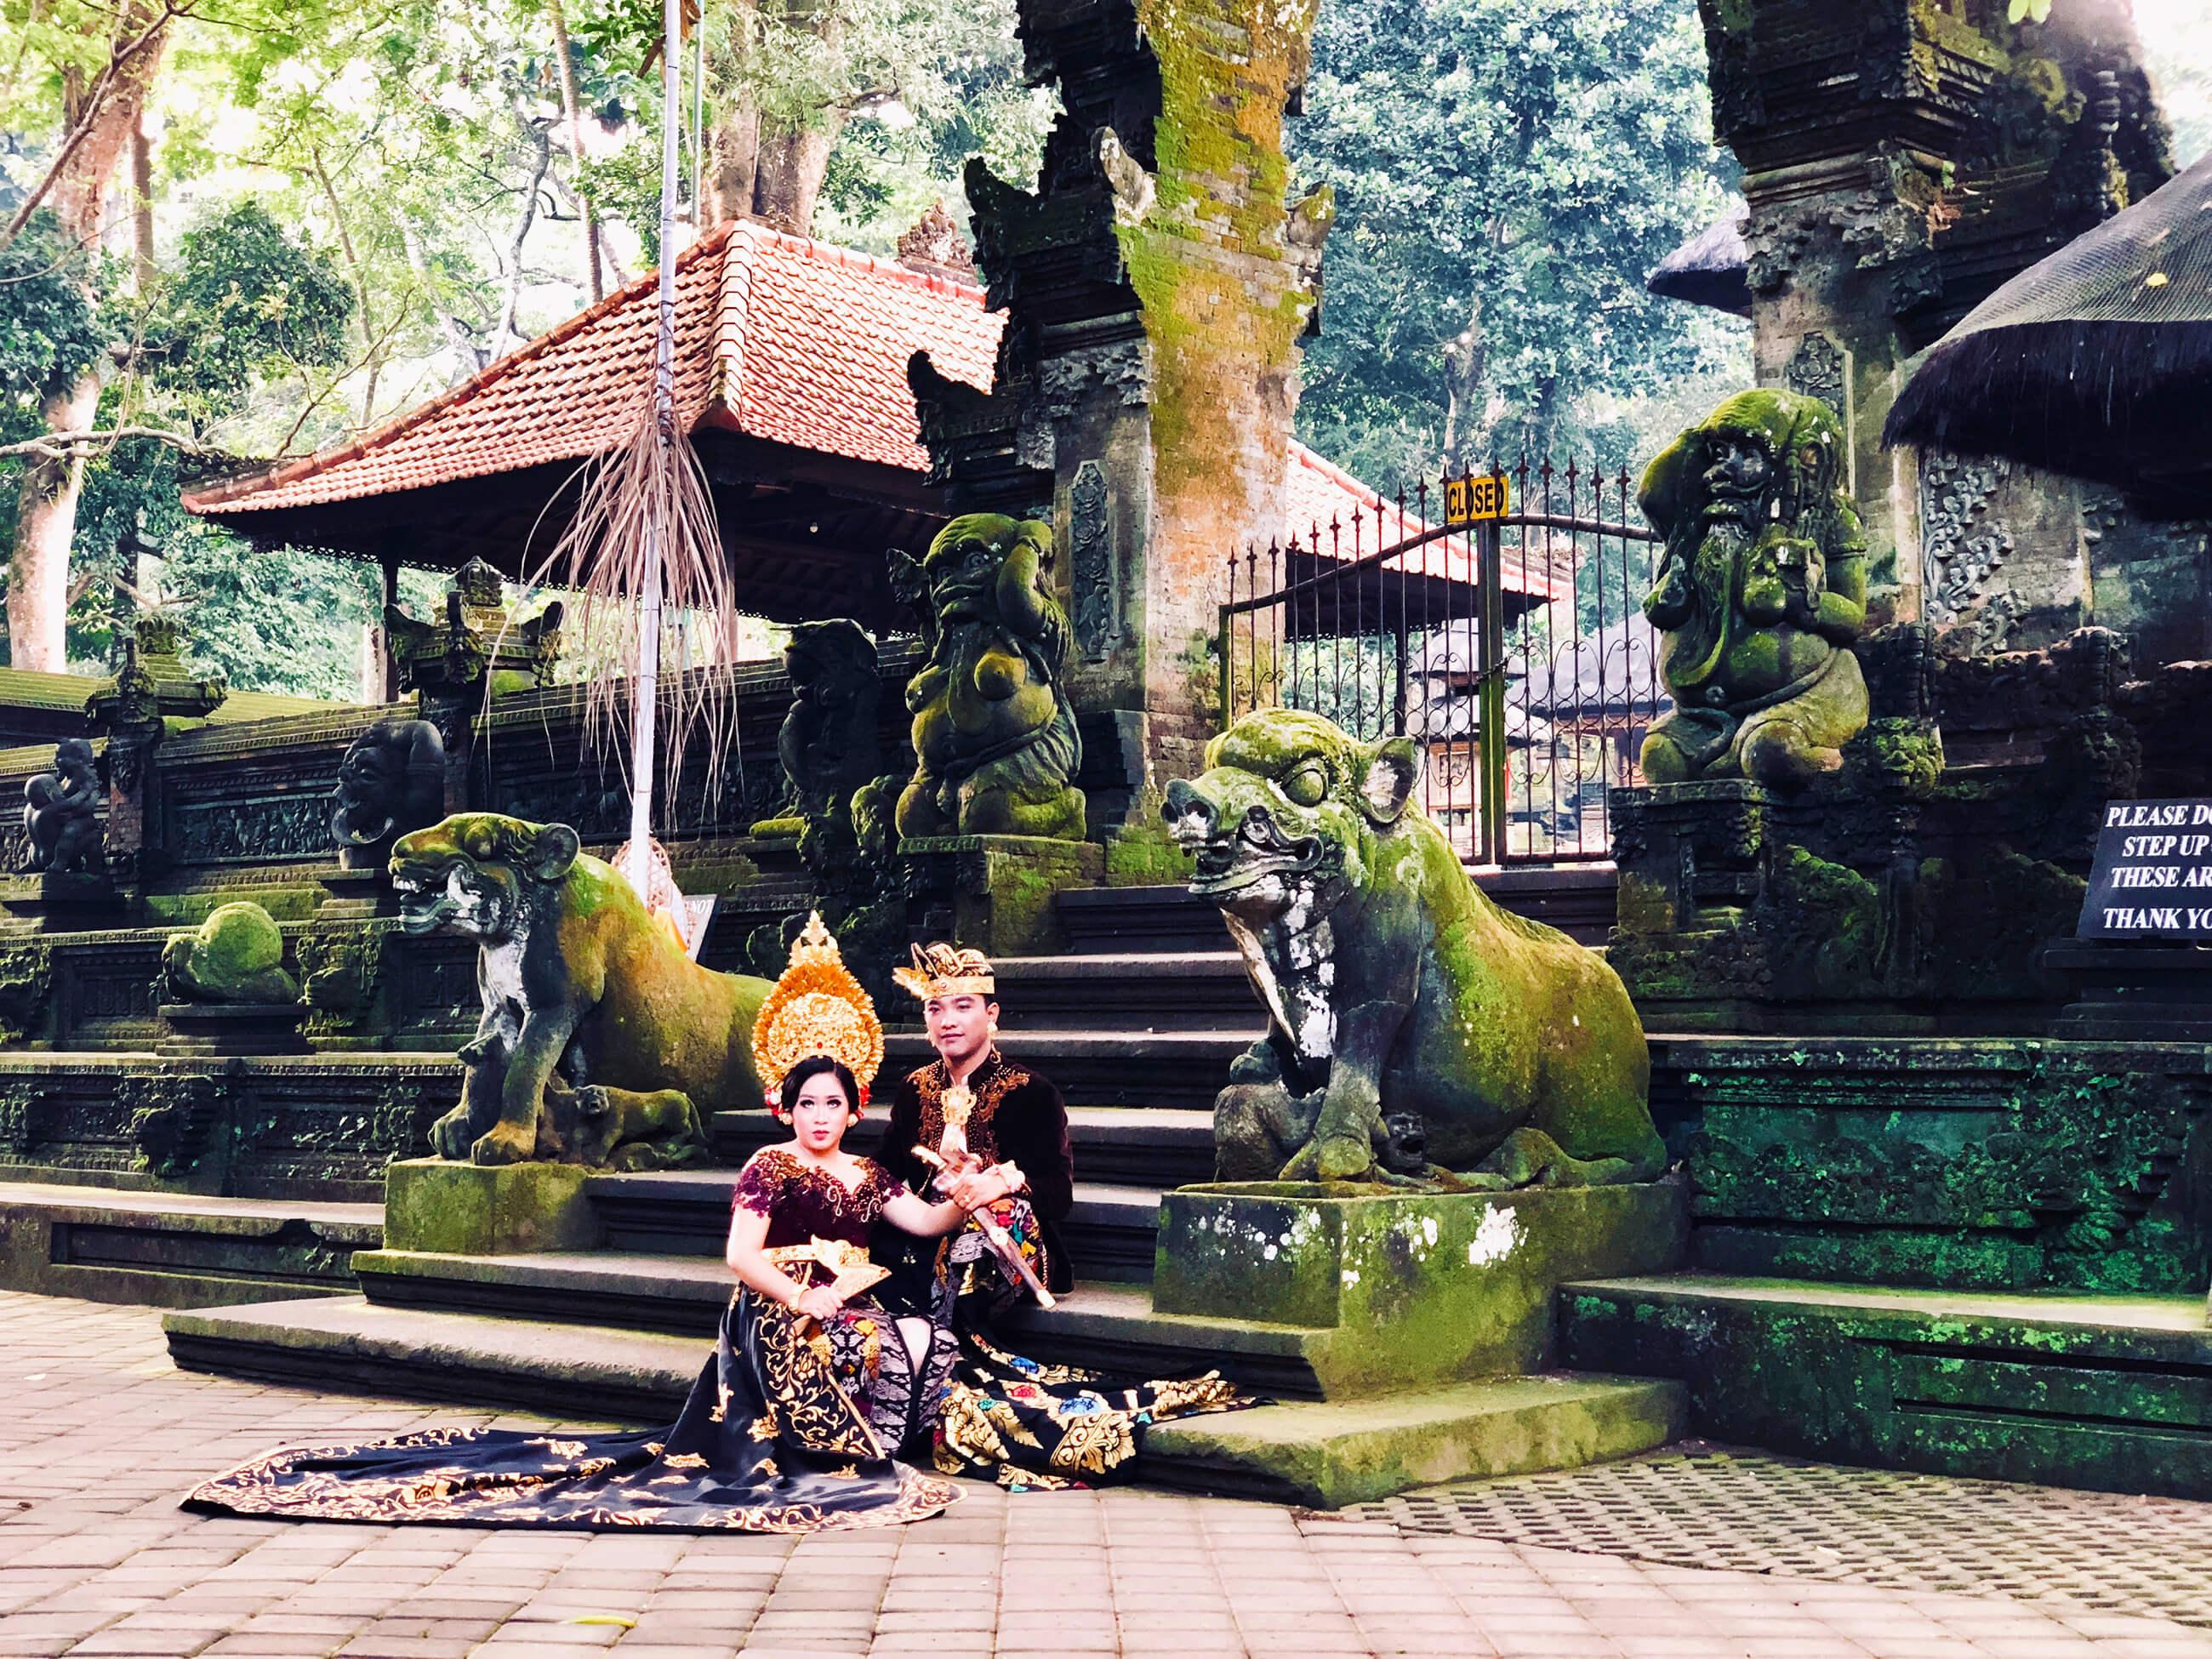 https://bubo.sk/uploads/galleries/7339/roberttaraba_indonezia_svadobcania_bali.jpg